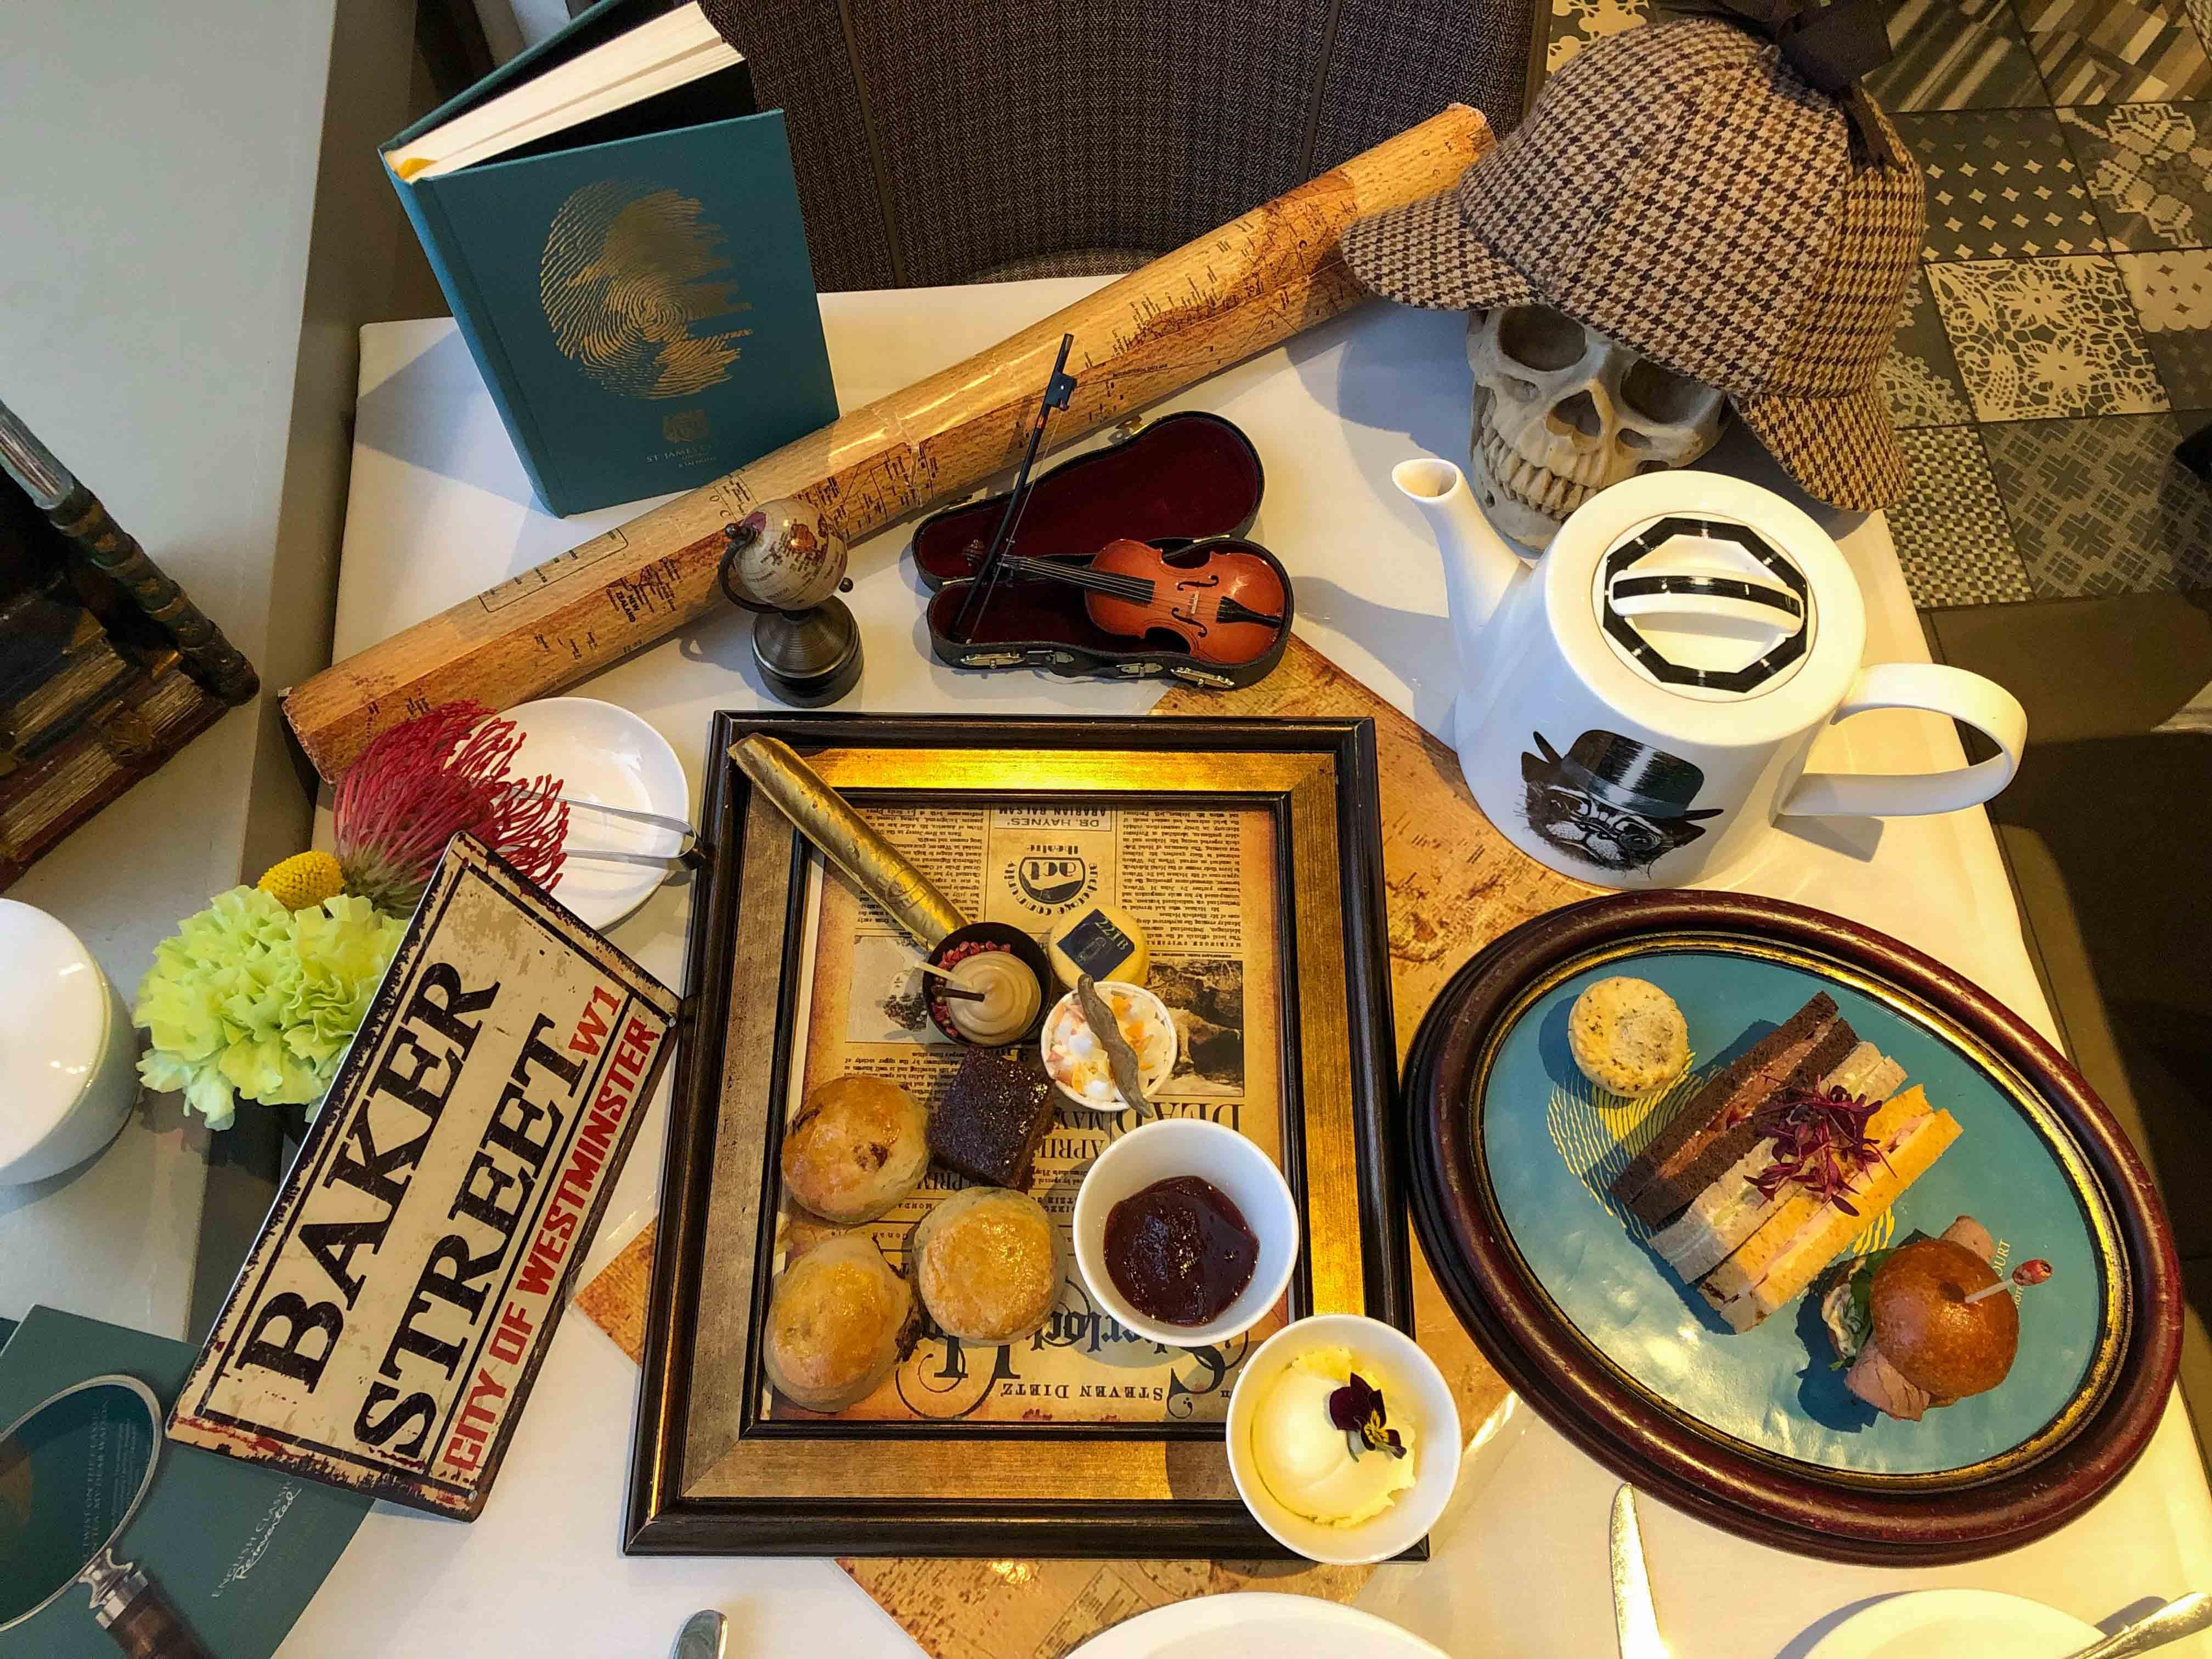 Sherlock Holmes afternoon tea in London